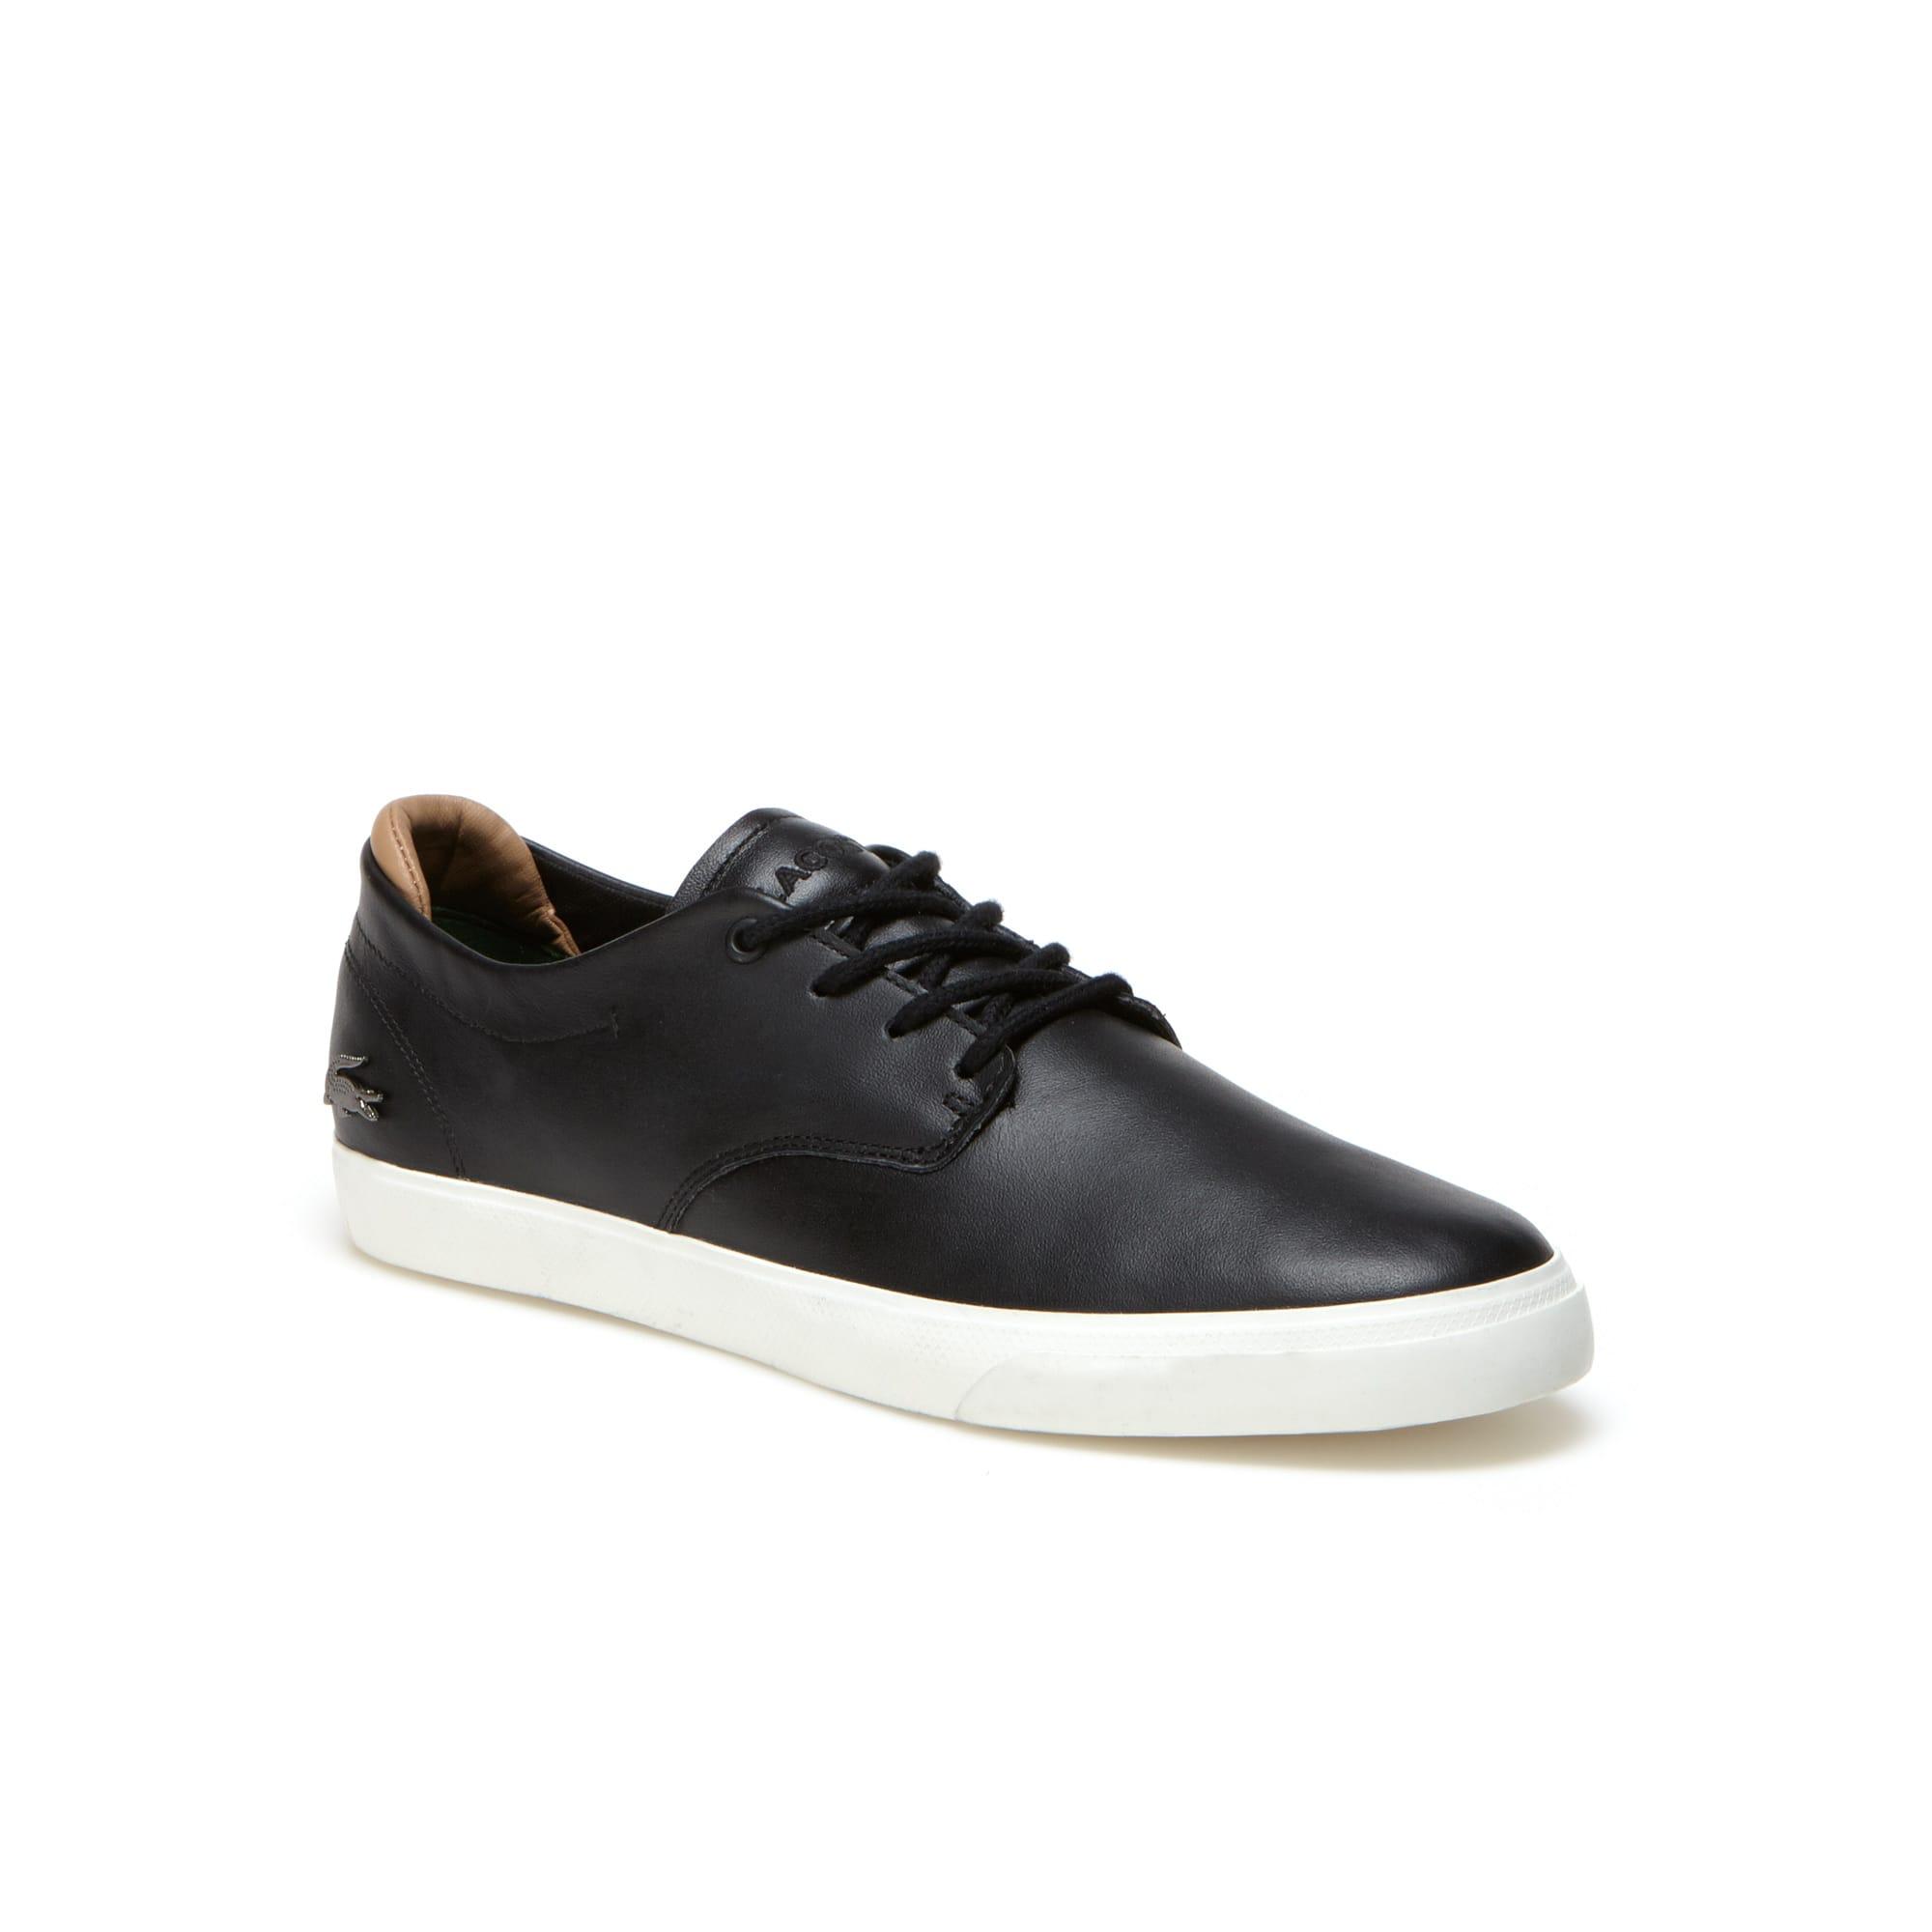 Herren-Sneakers ESPERE aus Leder